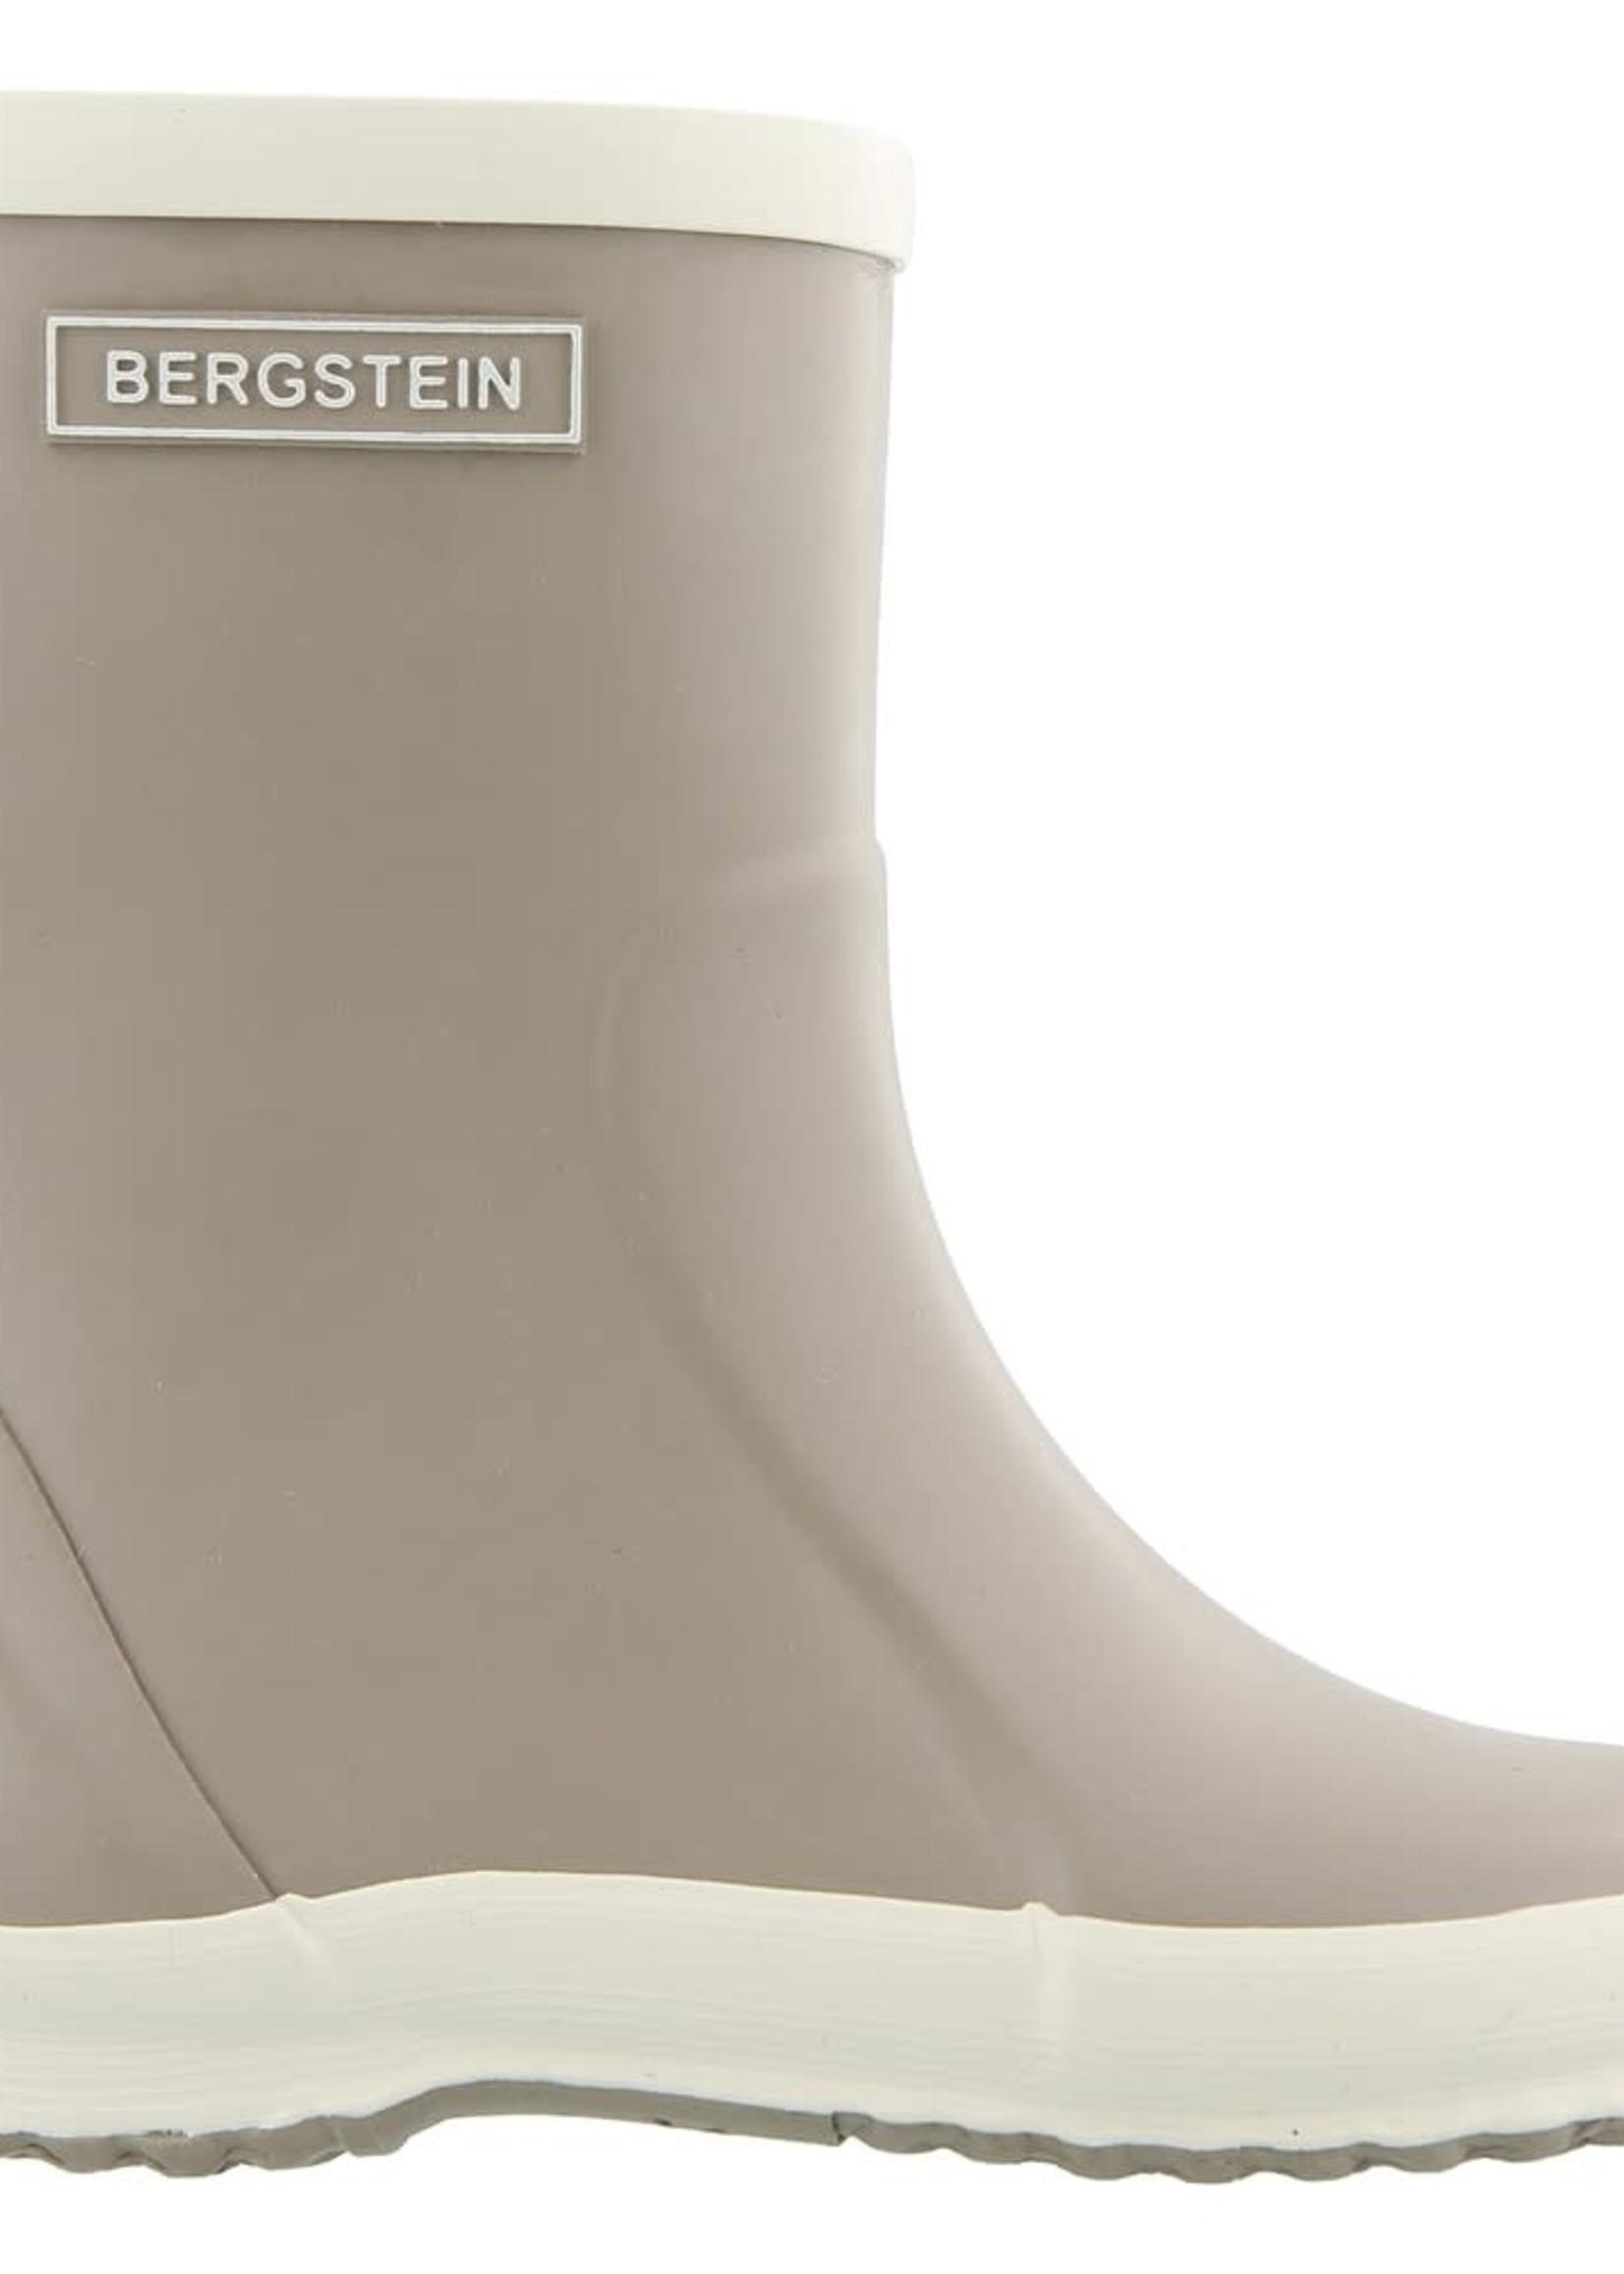 Bergstein Bergstein - Sand